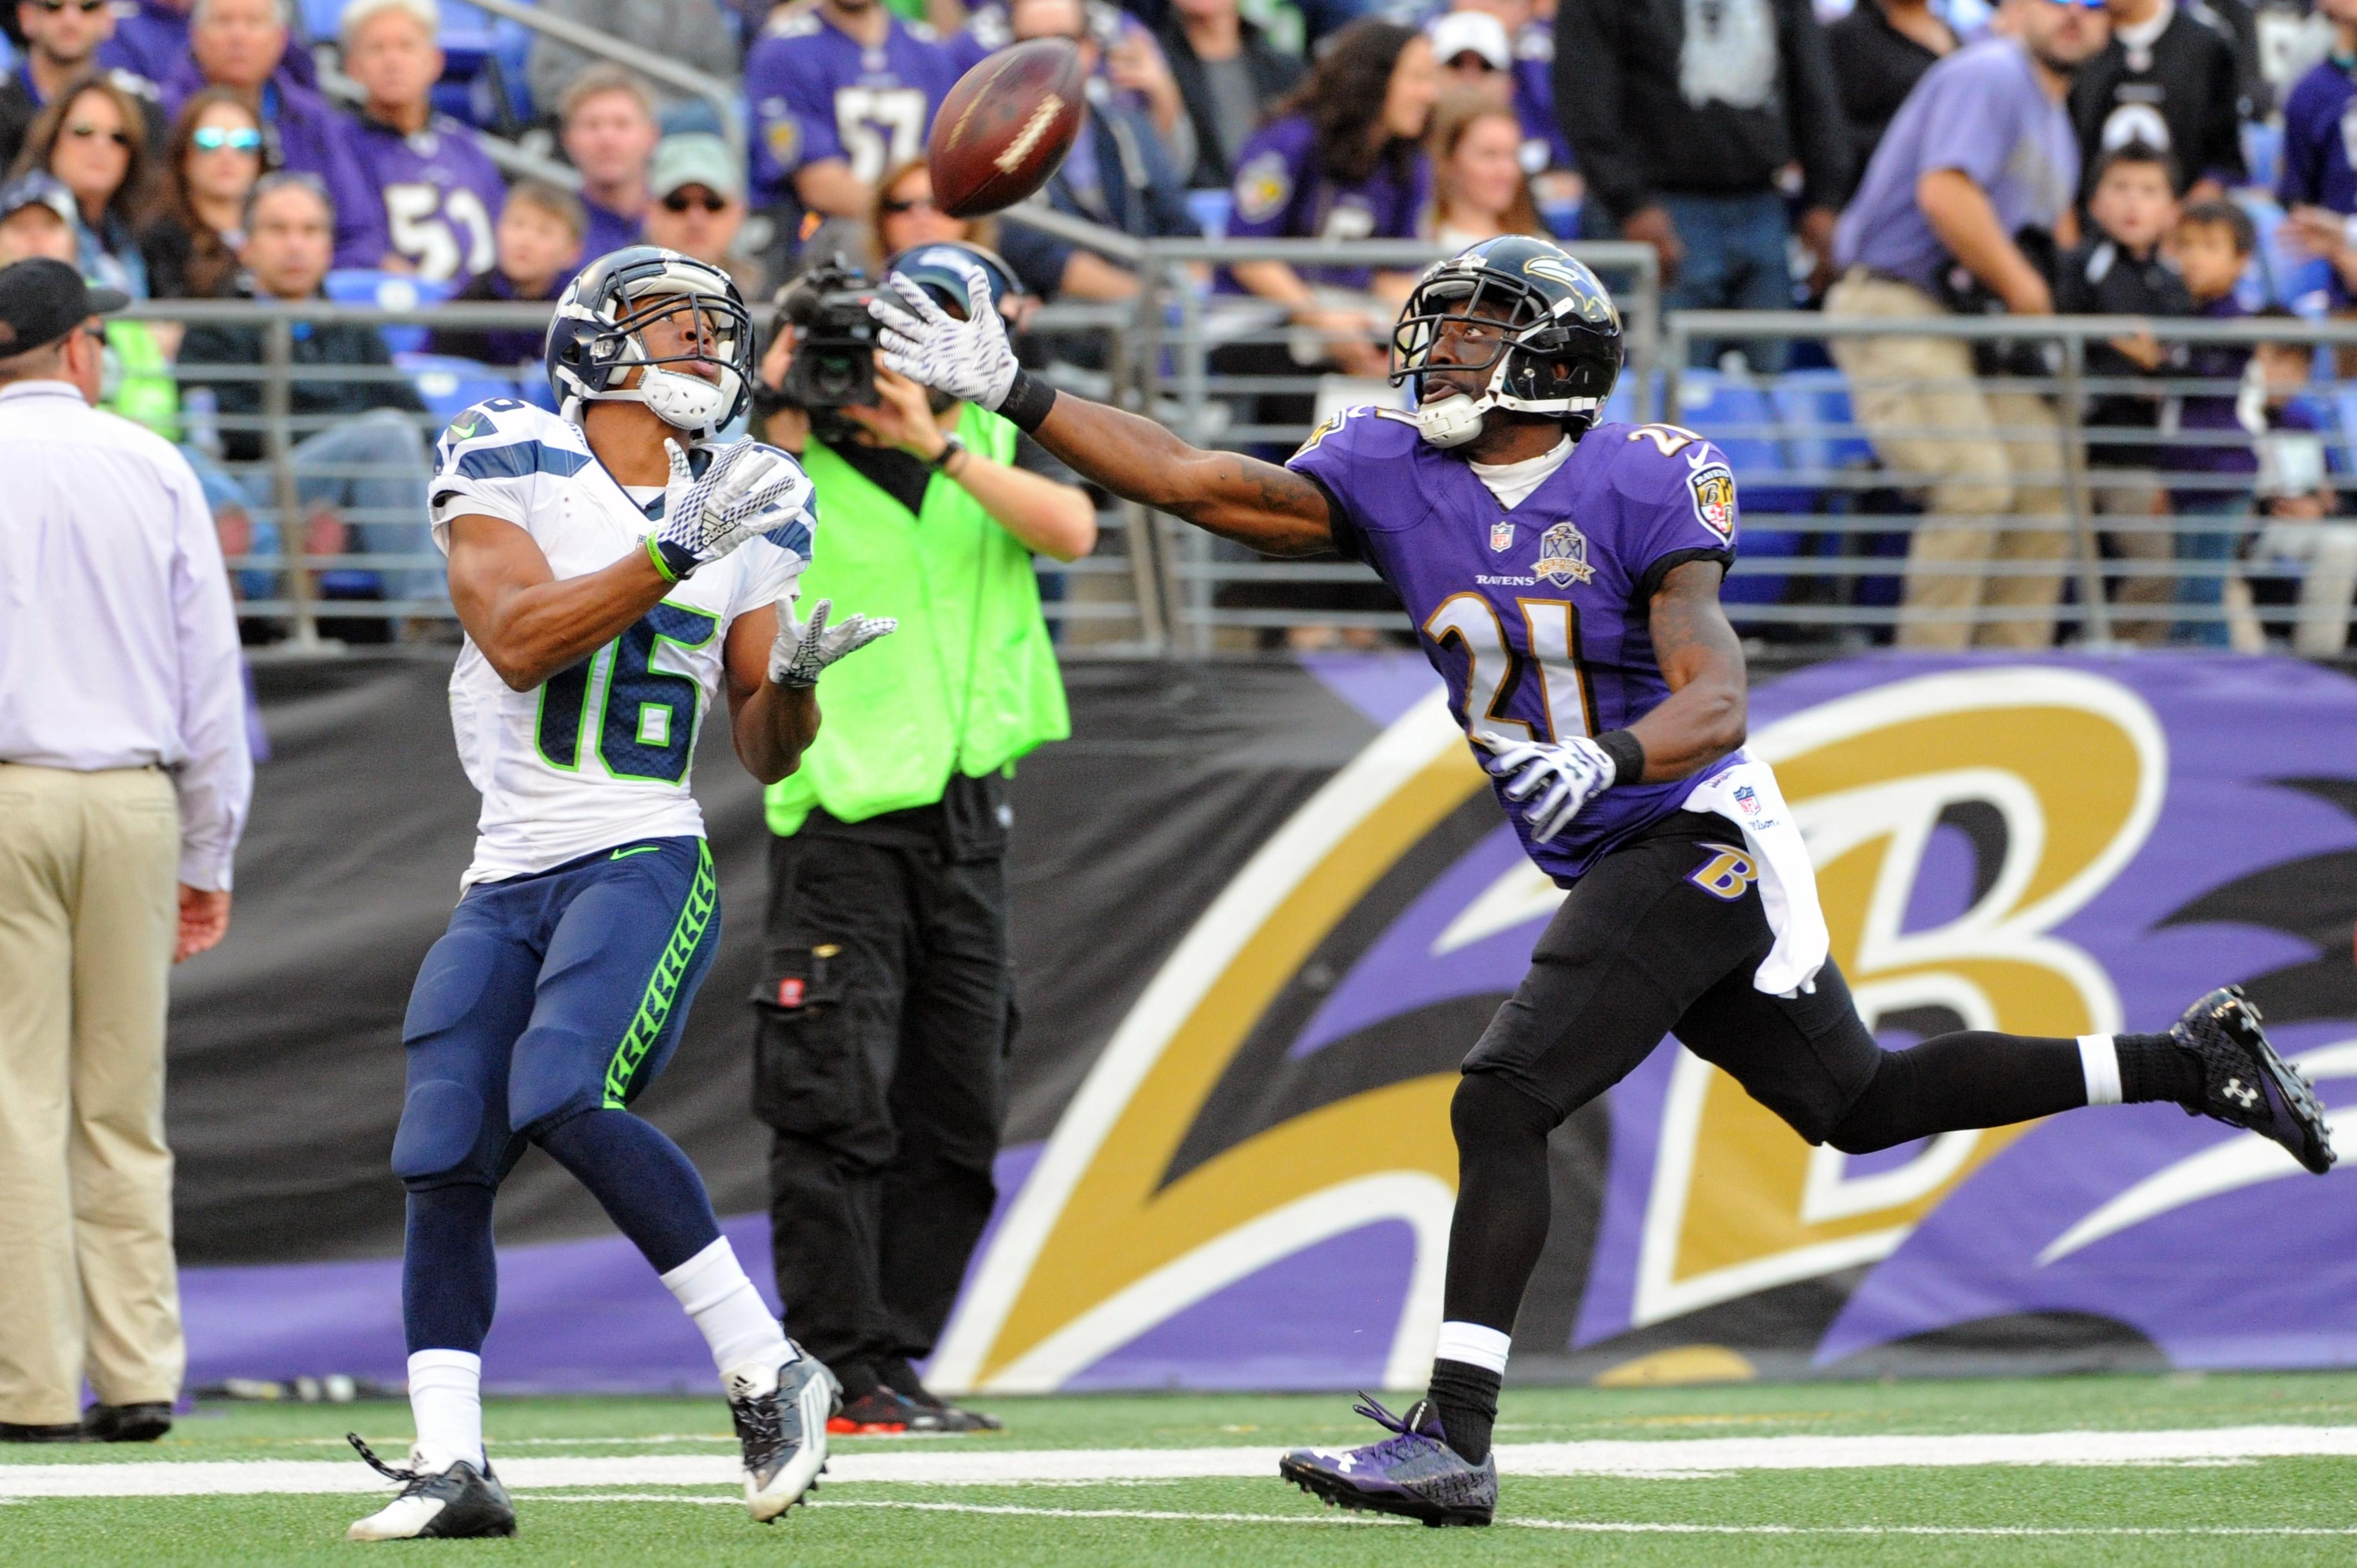 NFL: DEC 13 Seahawks at Ravens